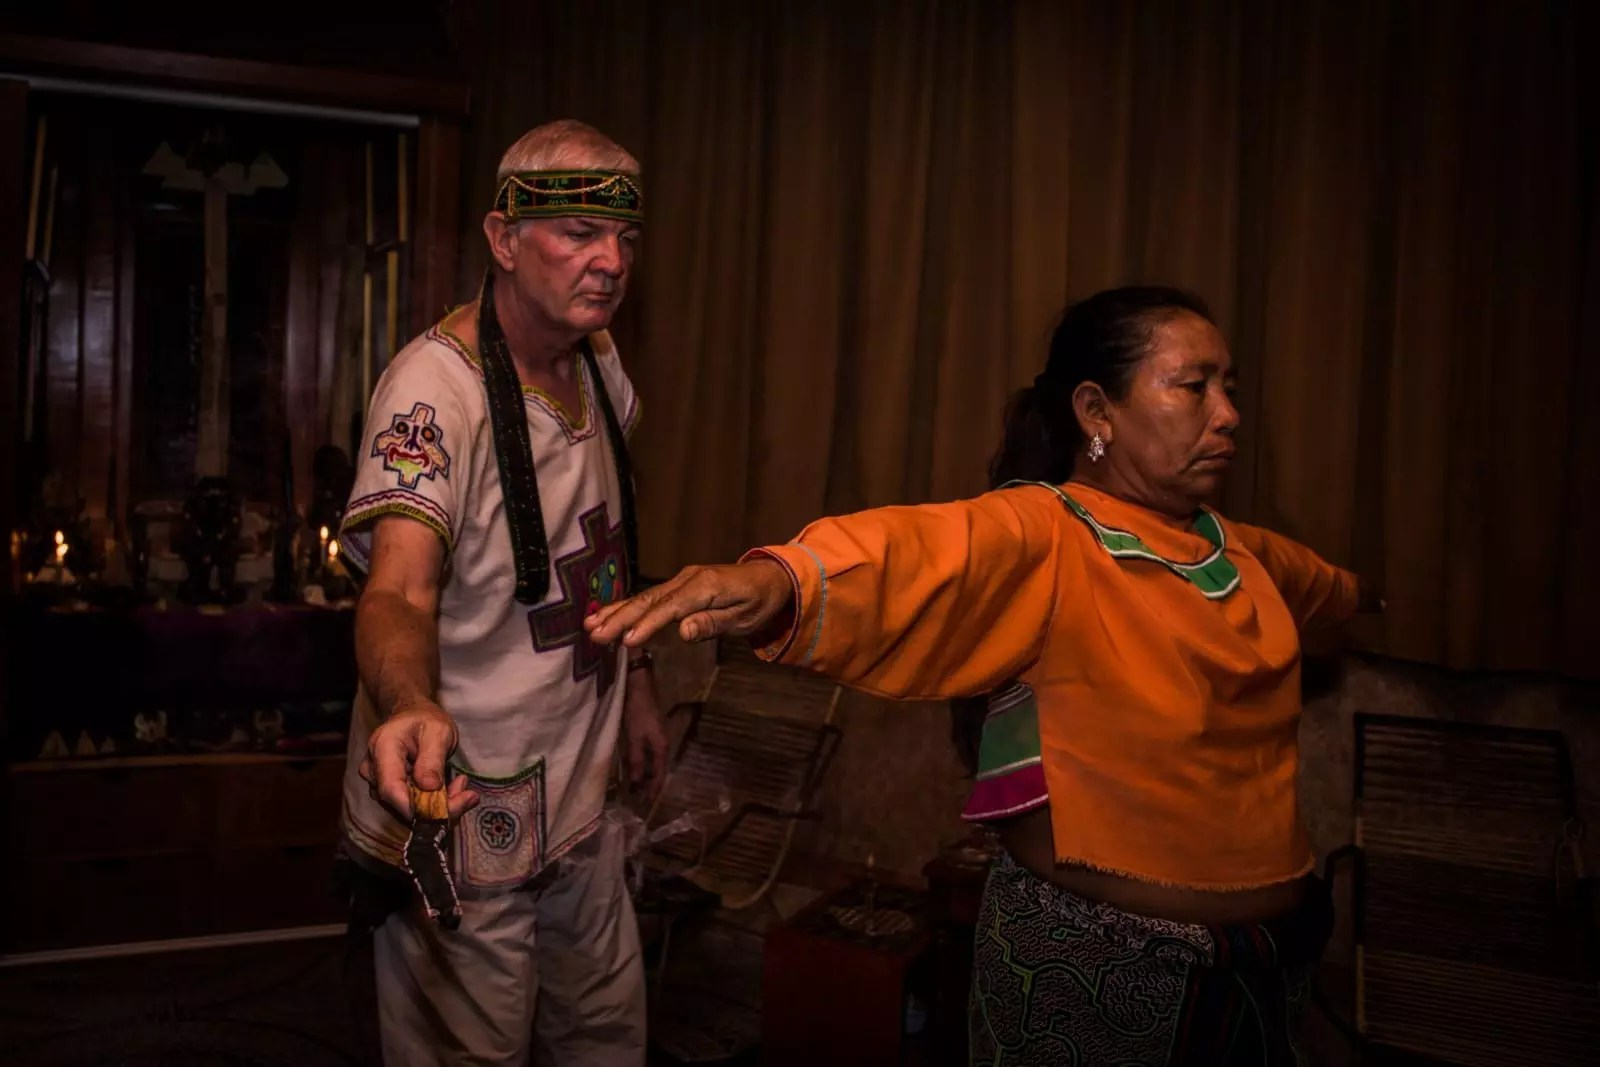 ayahuasca-ceremonies